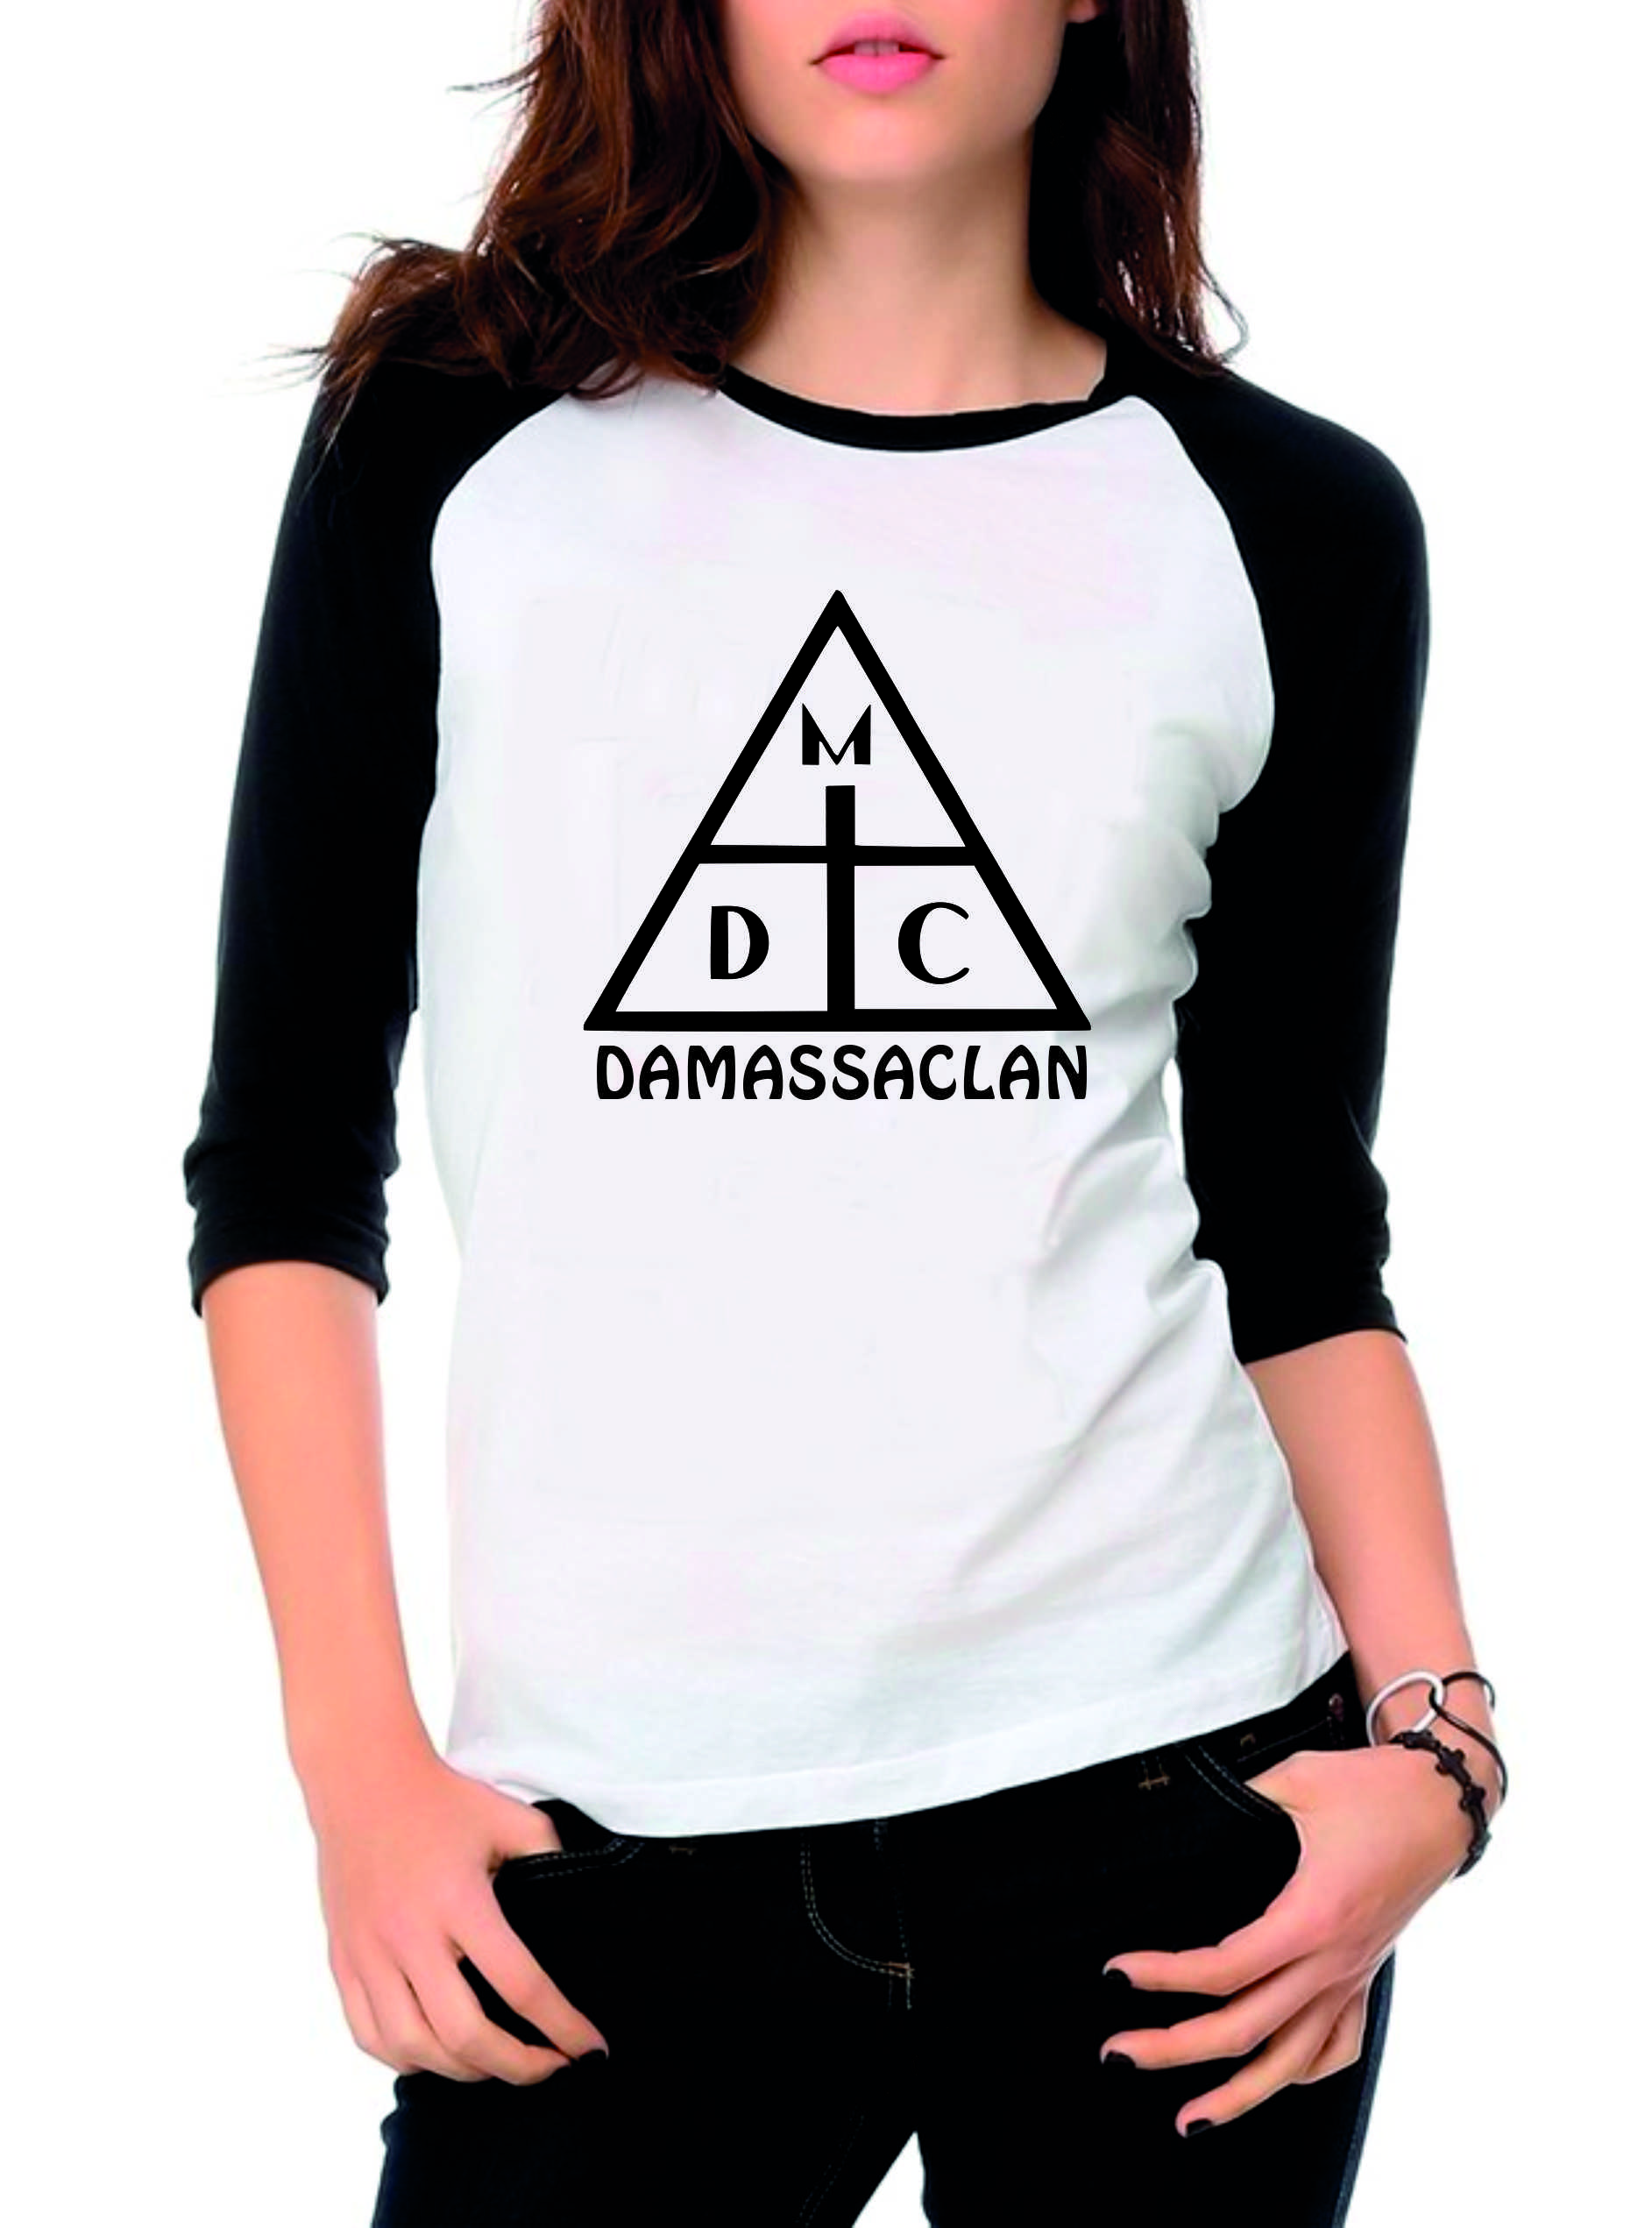 Camiseta Dmc  bebea924311